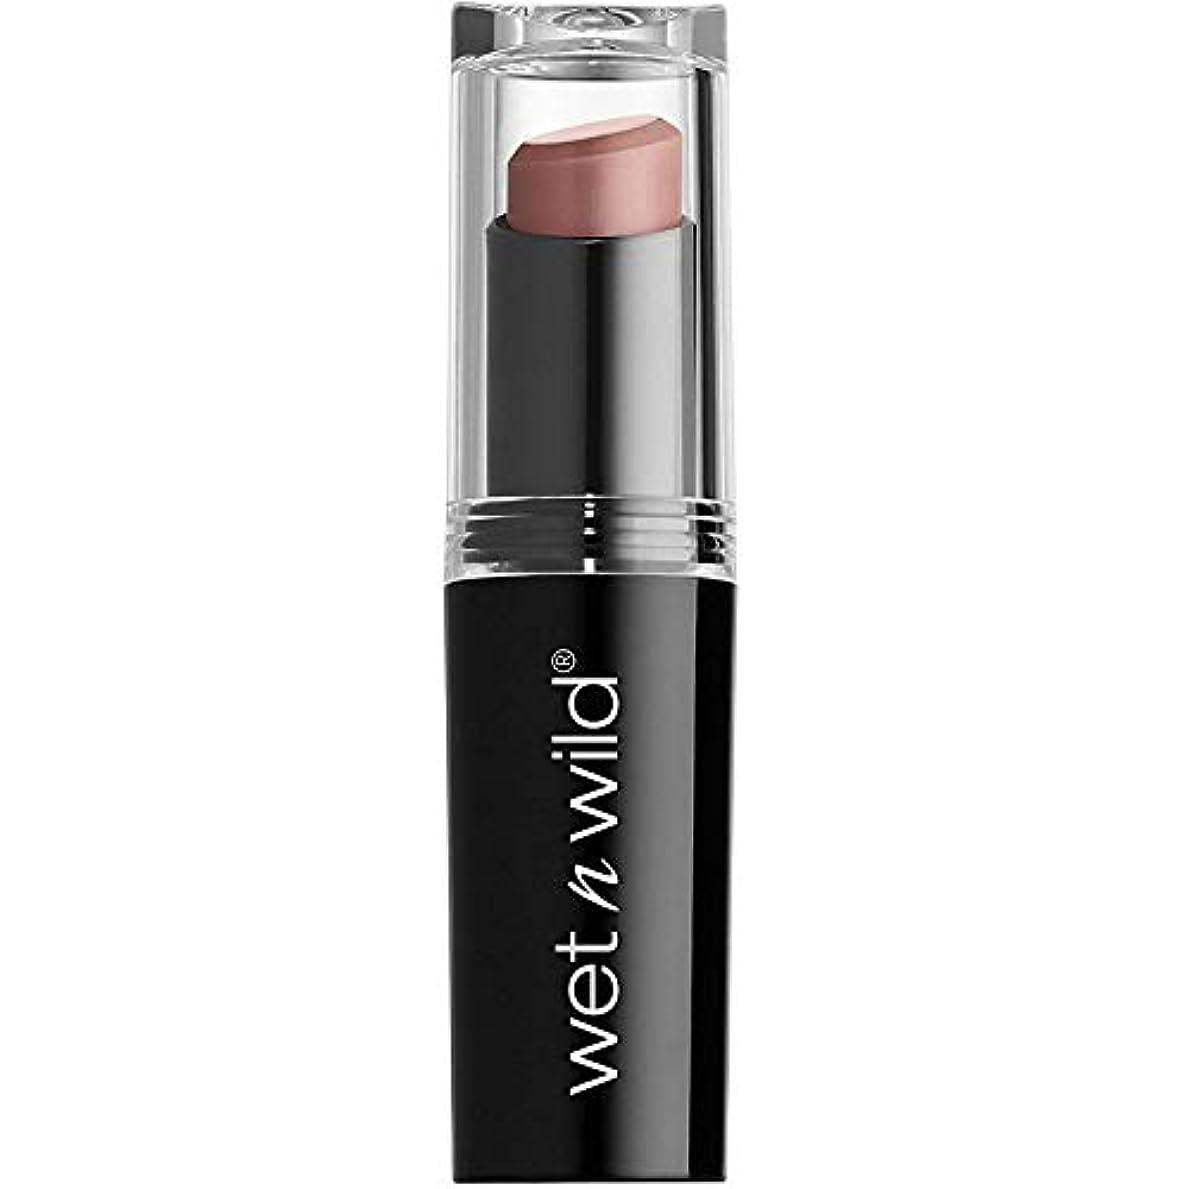 WET N WILD Mega Last Matte Lip Cover - Never Nude (並行輸入品)